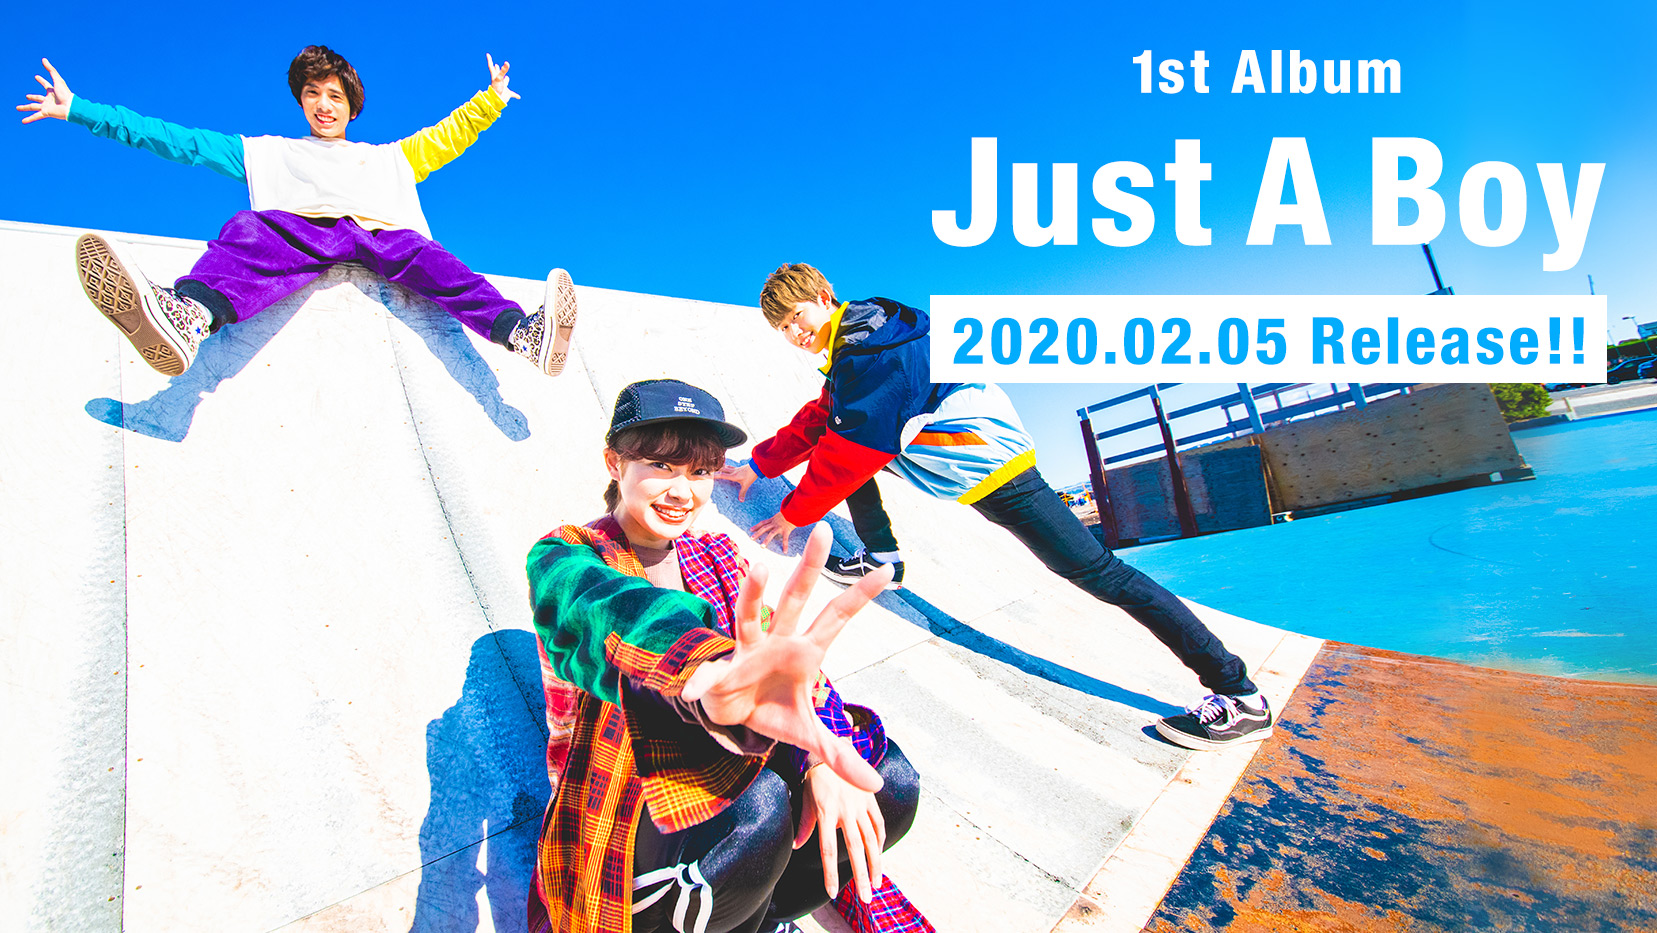 LONGMANメジャー1st Album 『Just A Boy』2020.02.05リリース決定!